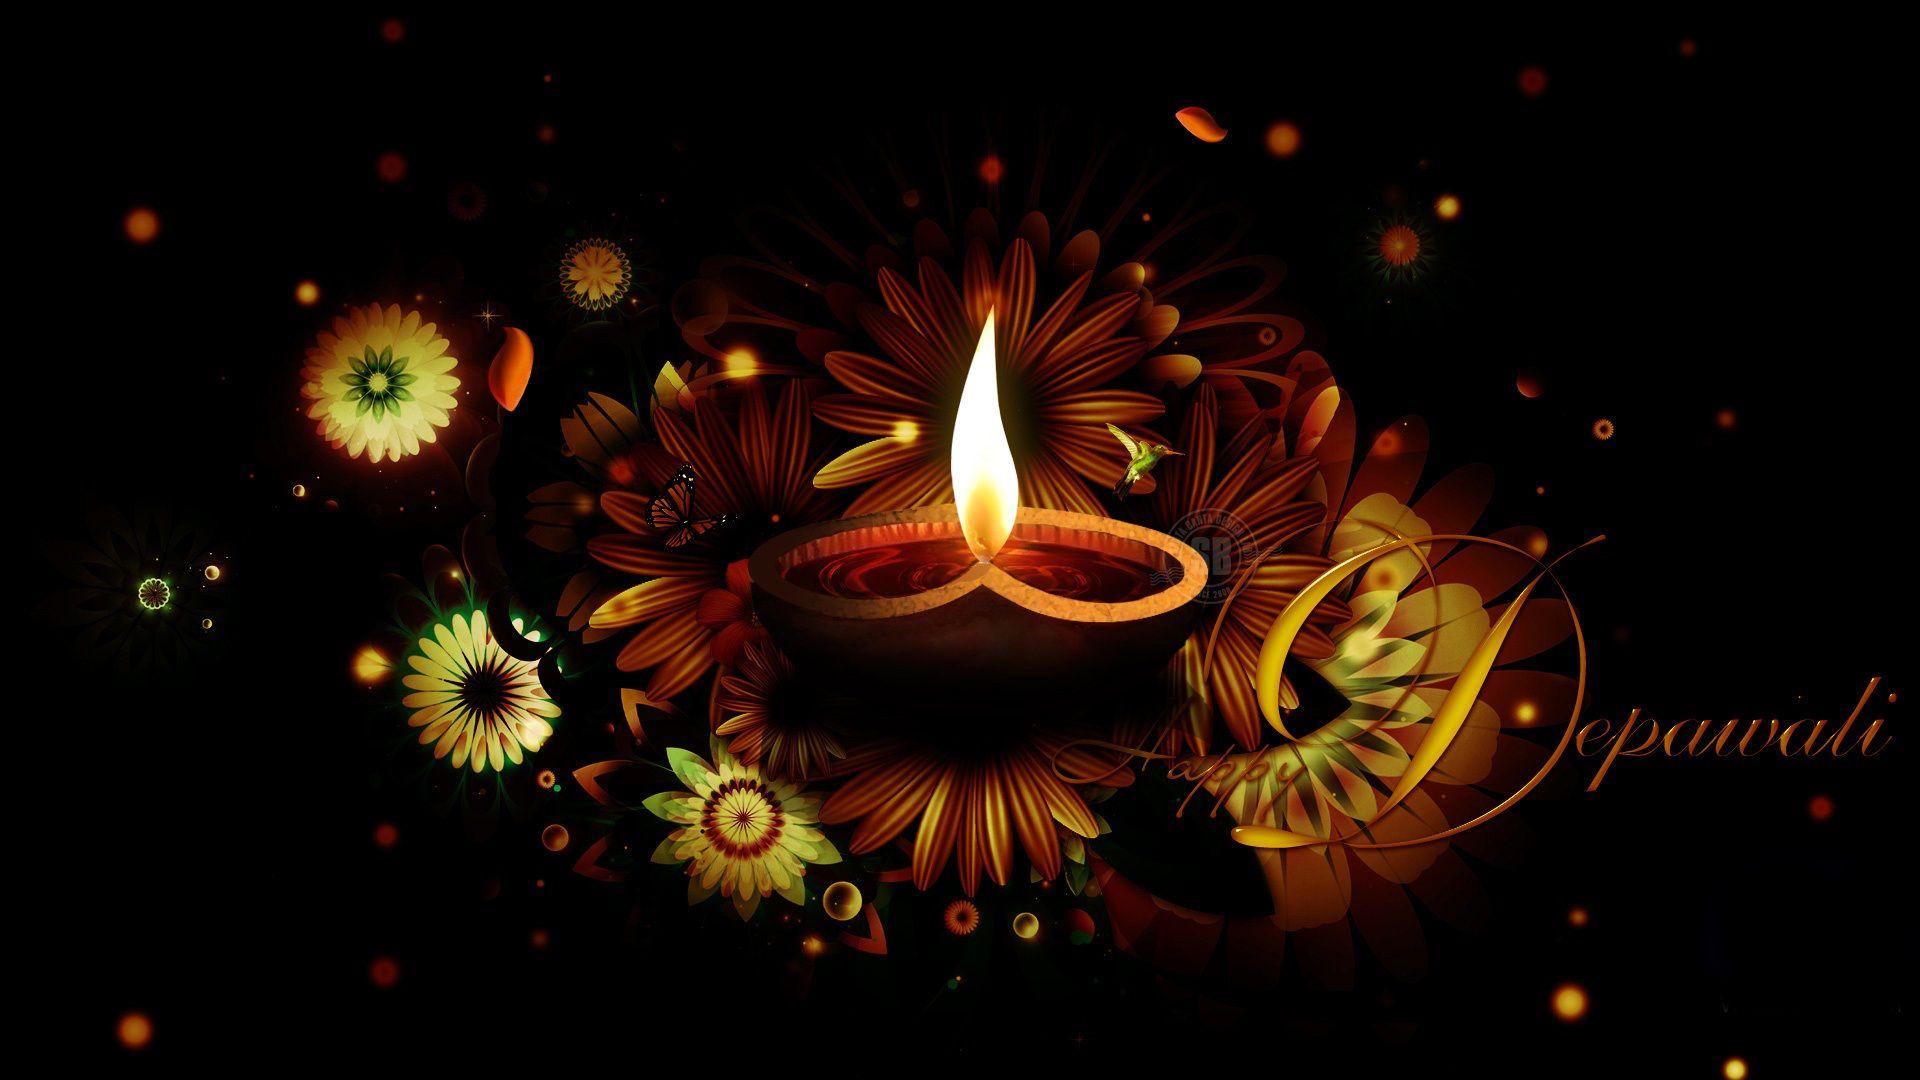 free download 20 happy diwali 2015 hd wallpapers | epic car